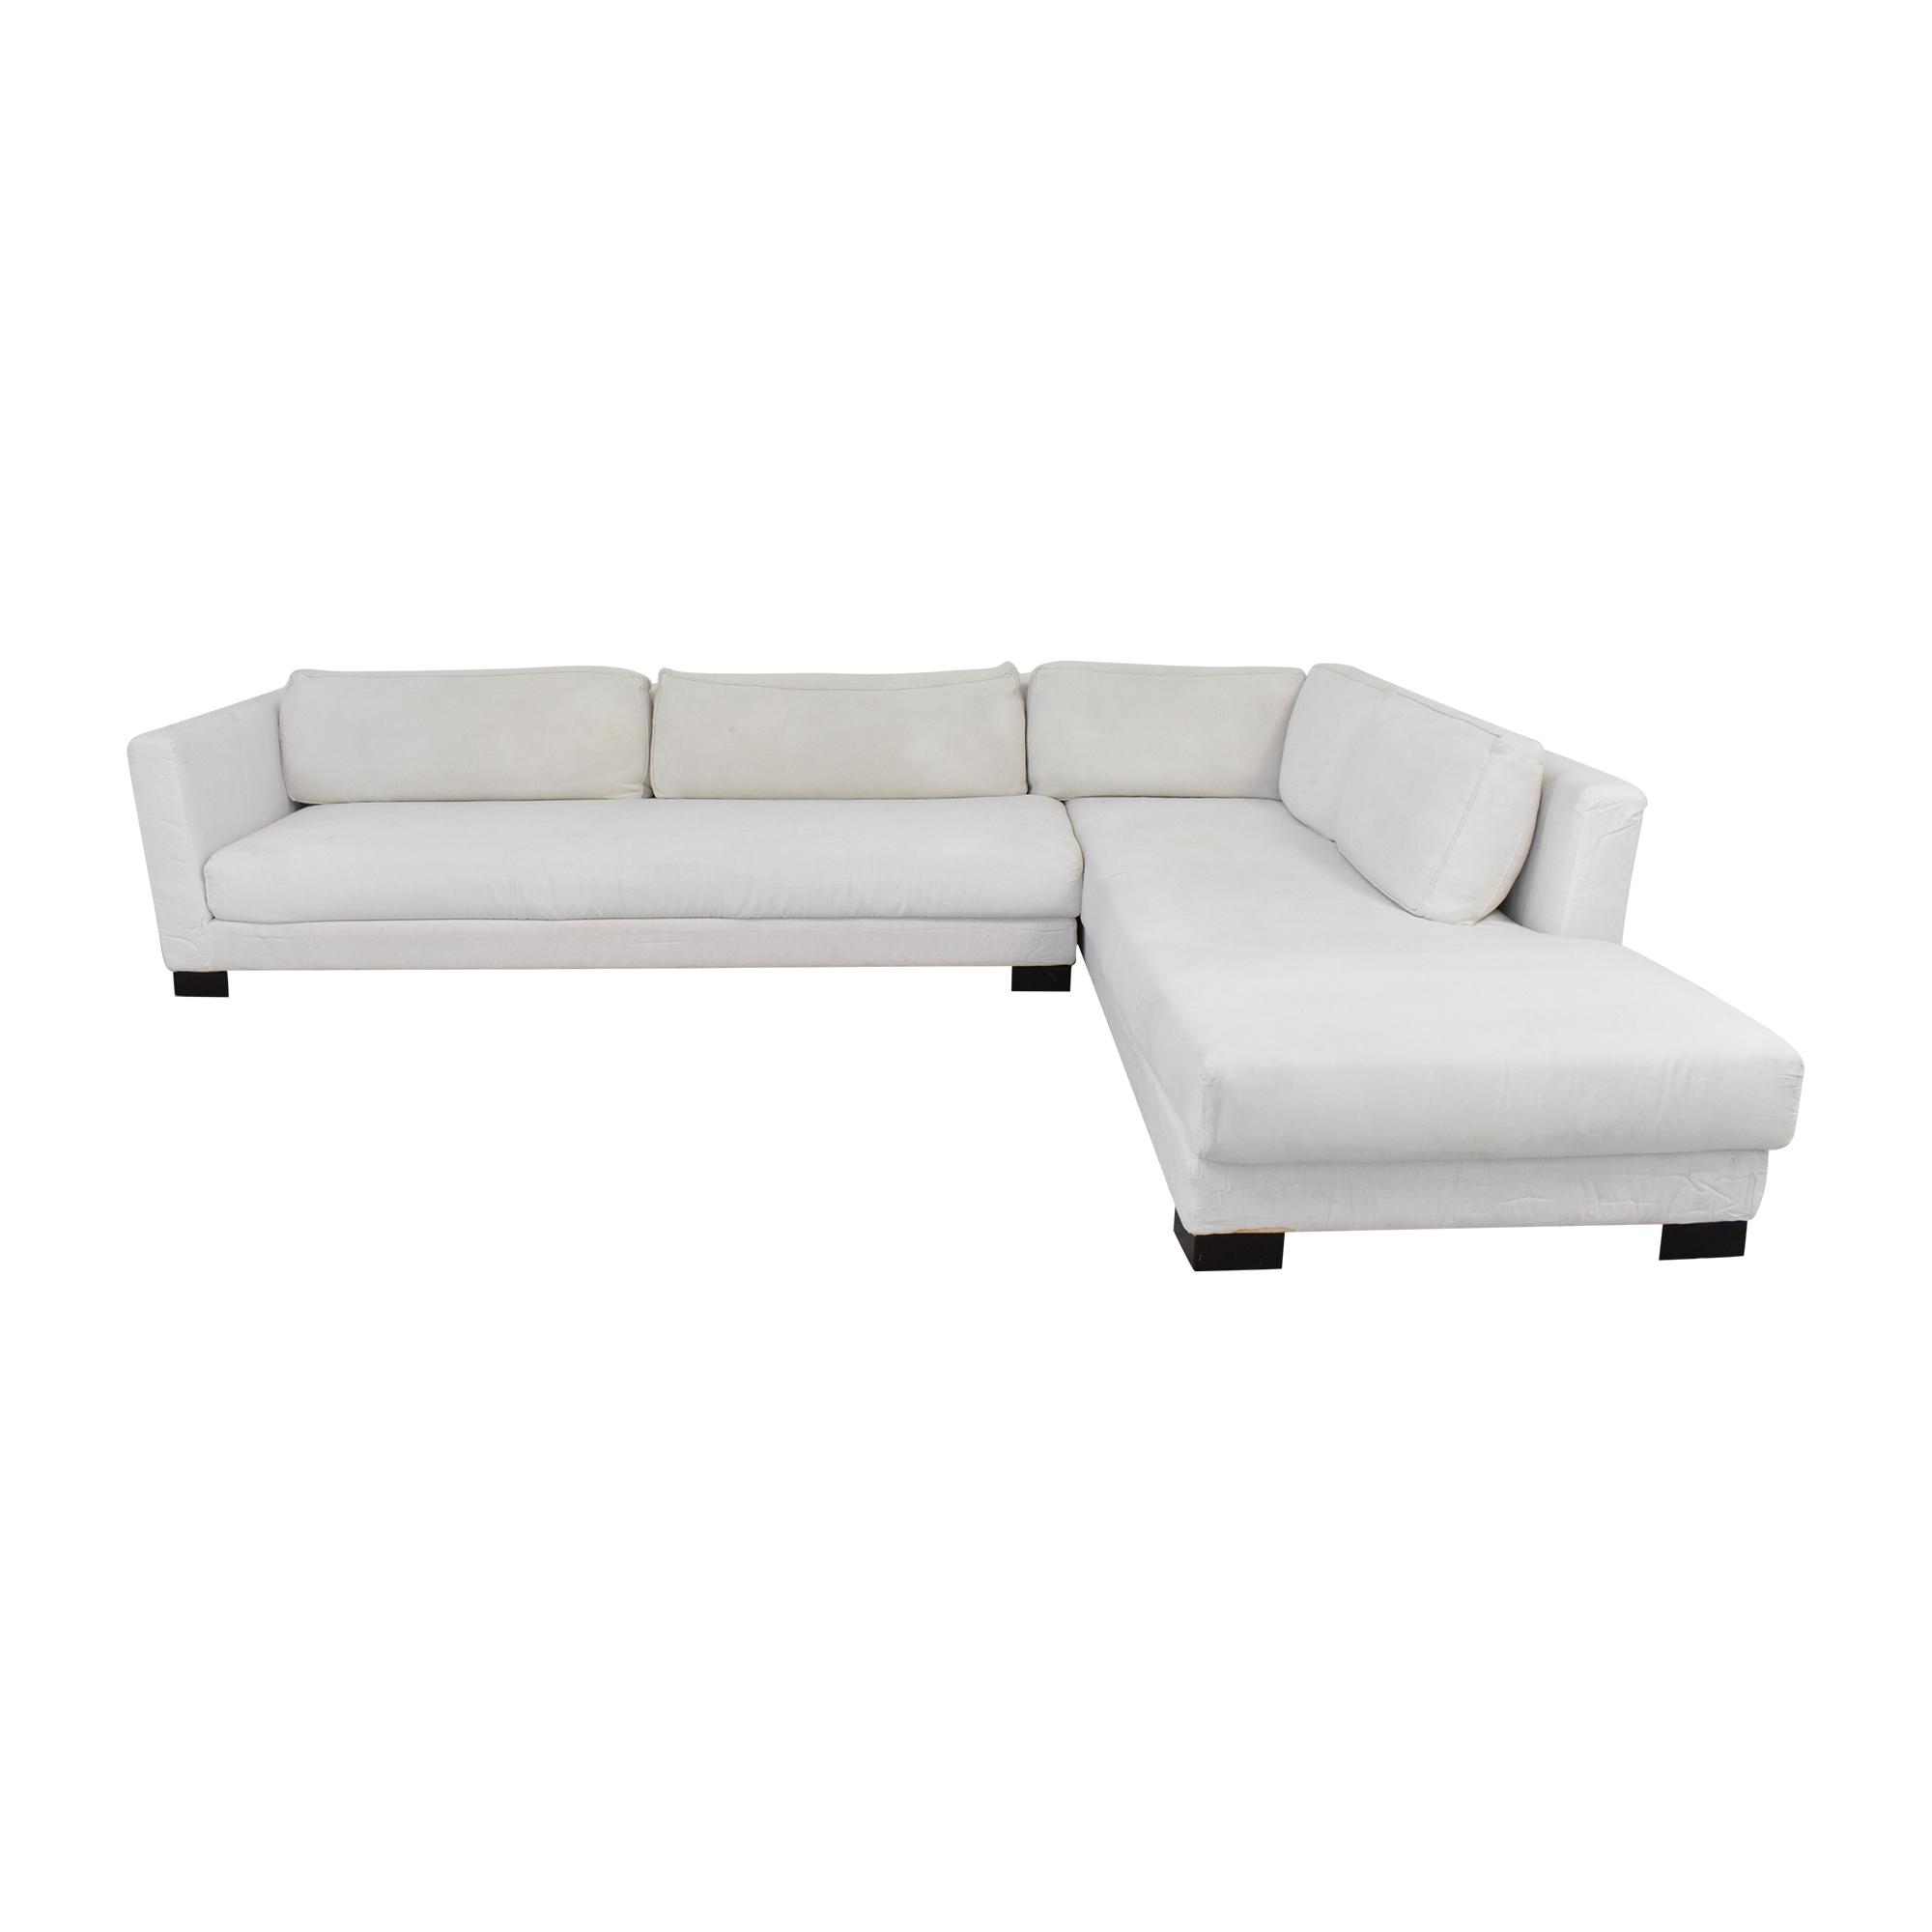 buy Verzelloni Link Sectional Sofa with Chaise Verzelloni